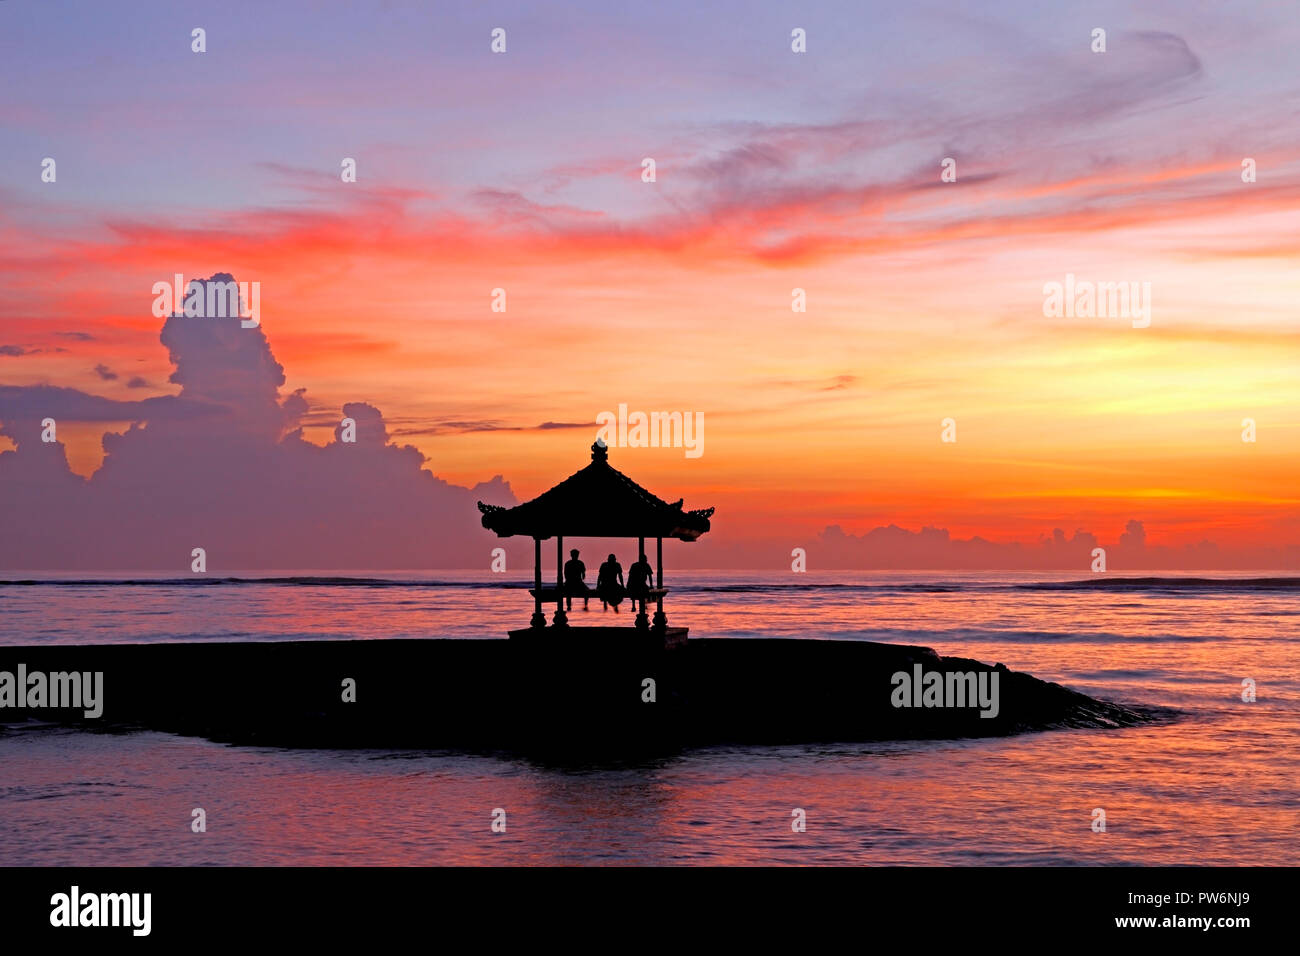 three-people-sitting-in-a-balinese-pagoda-on-sanur-beach-at-sunrise-sanur-beach-bali-indonesia-PW6NJ9.jpg